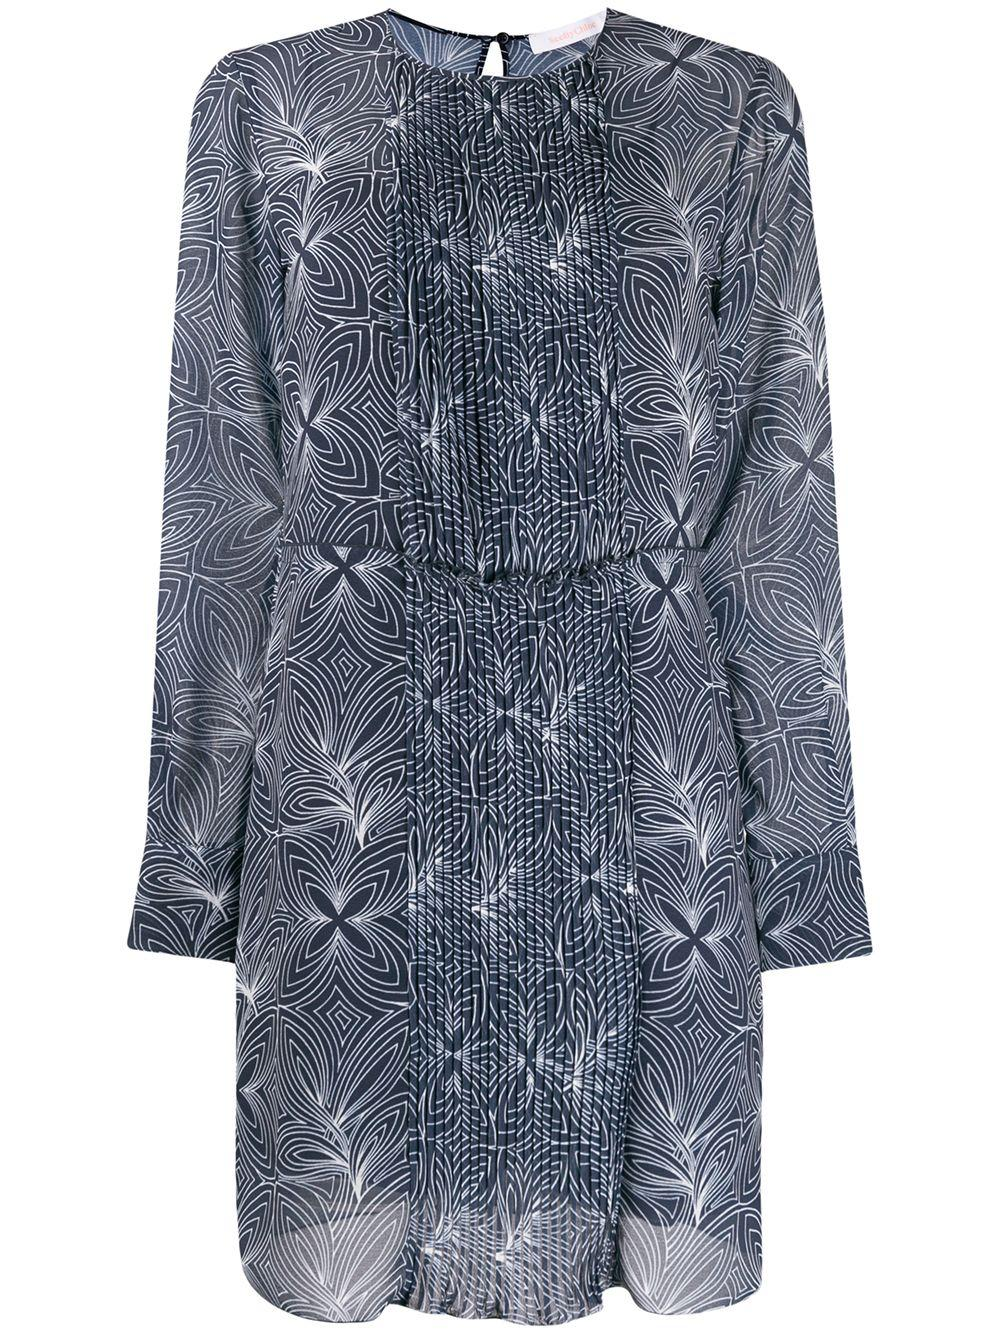 Long Sleeve Geo Floral On Georgette Dress Item # CHS20SRO08026